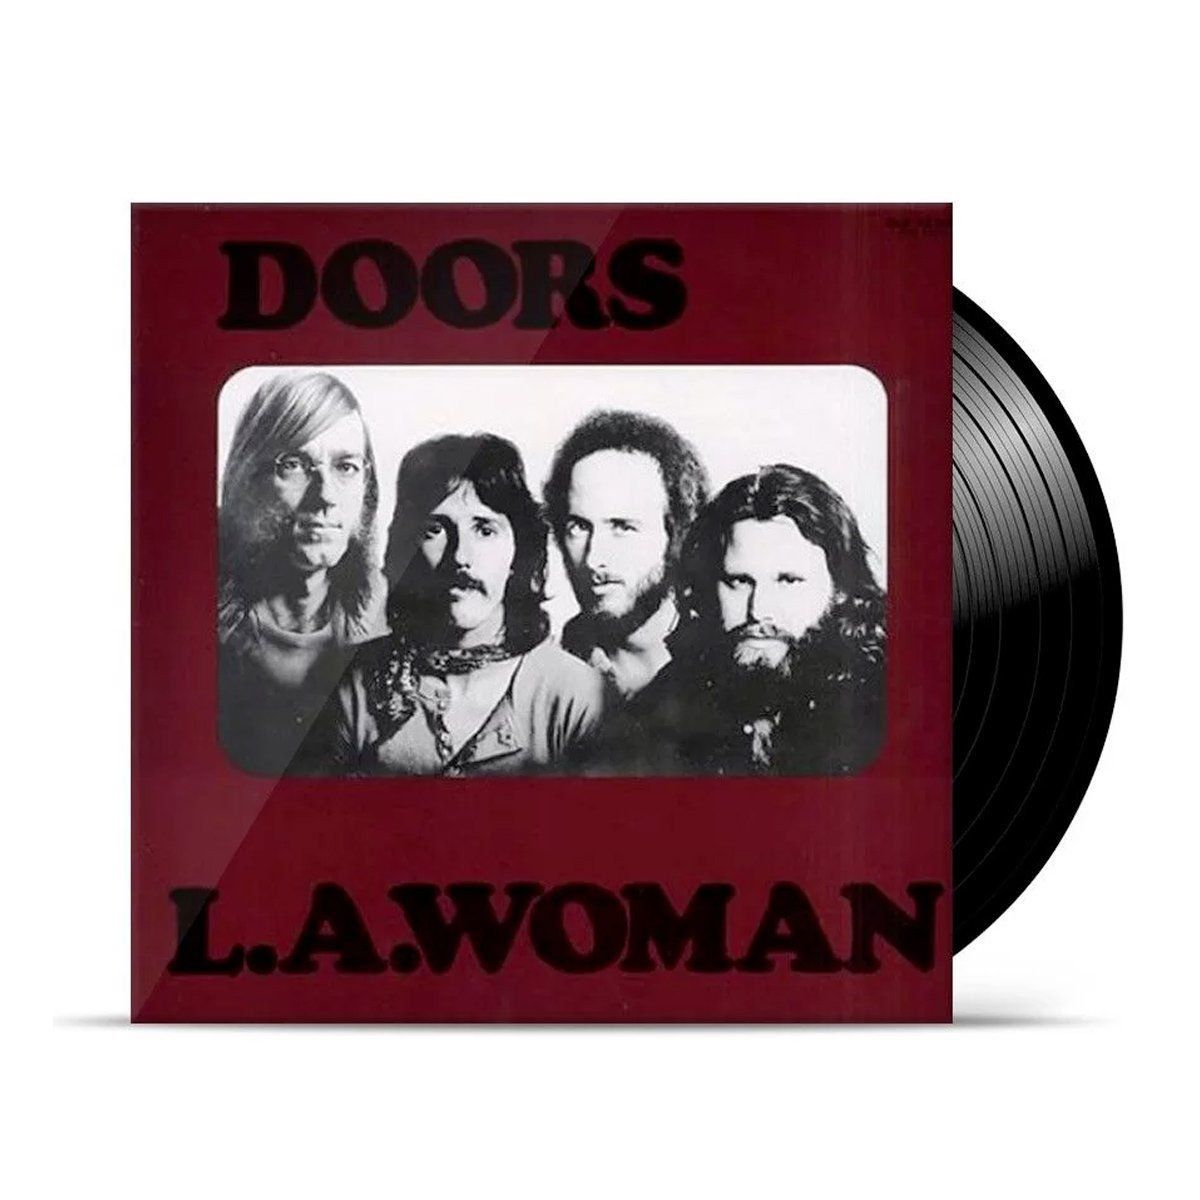 LP The Doors L.A. Woman  - bandUP Store Marketplace